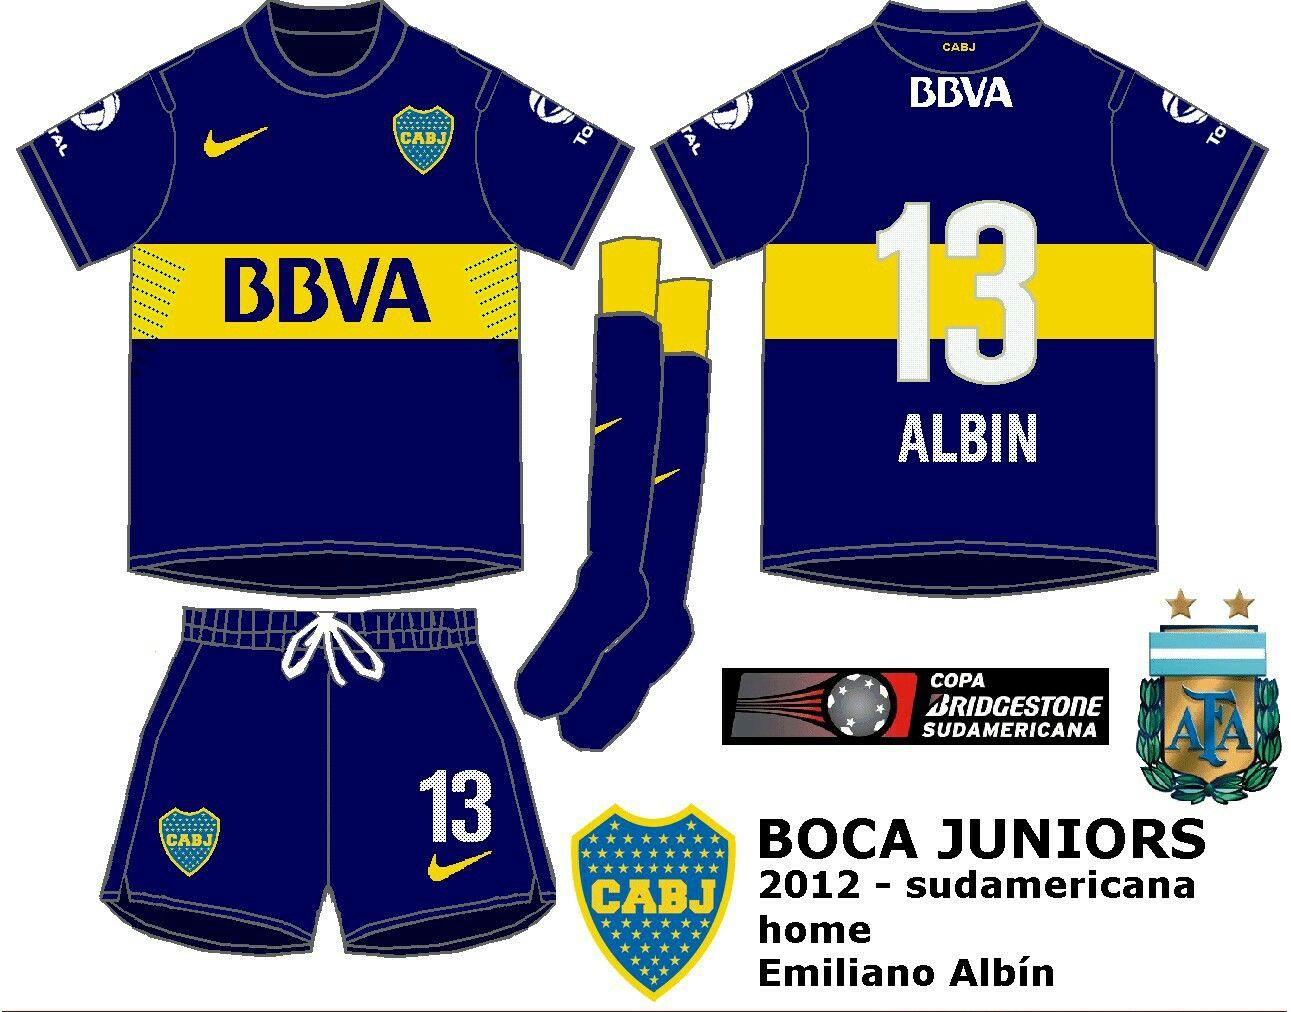 reputable site 8062d 1e5d2 Boca Juniors of Argentina home kit for 2012.   2010s ...